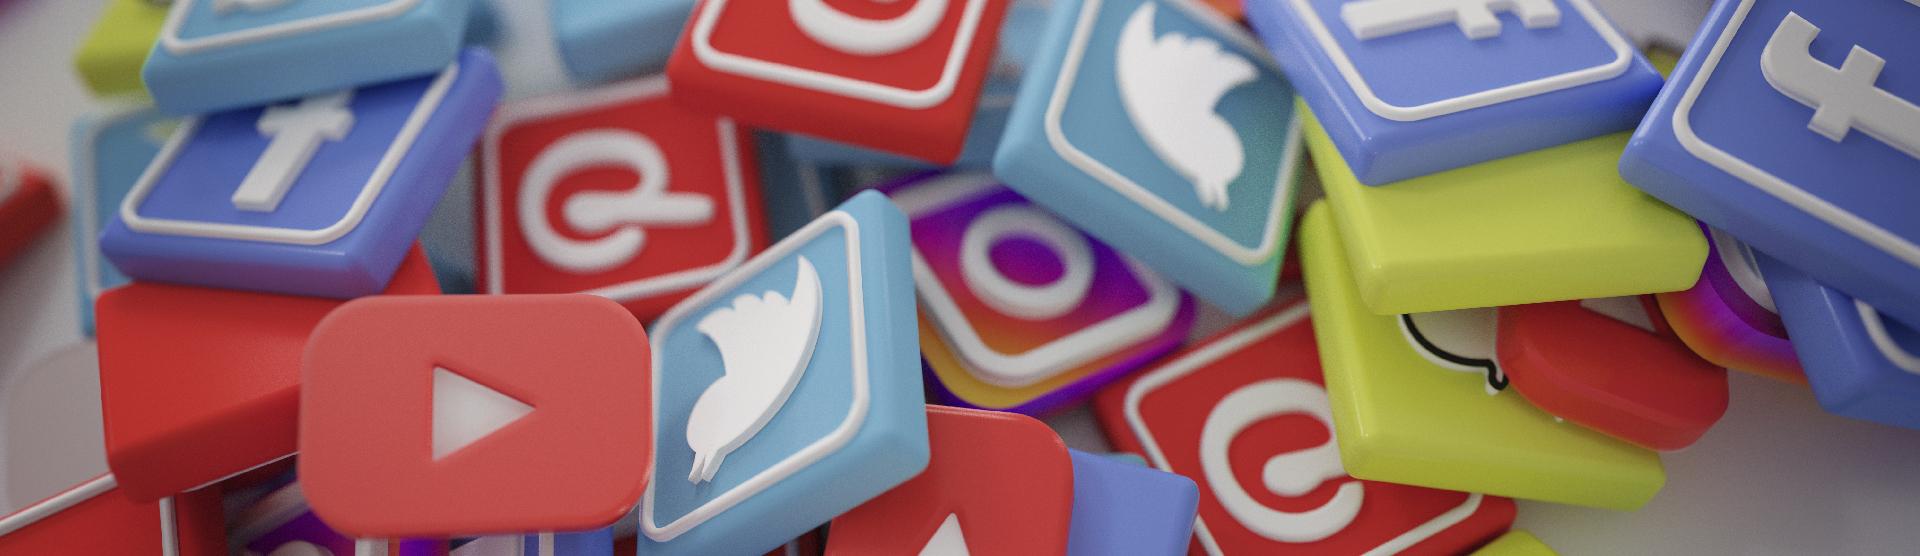 triar xarxa social negoci